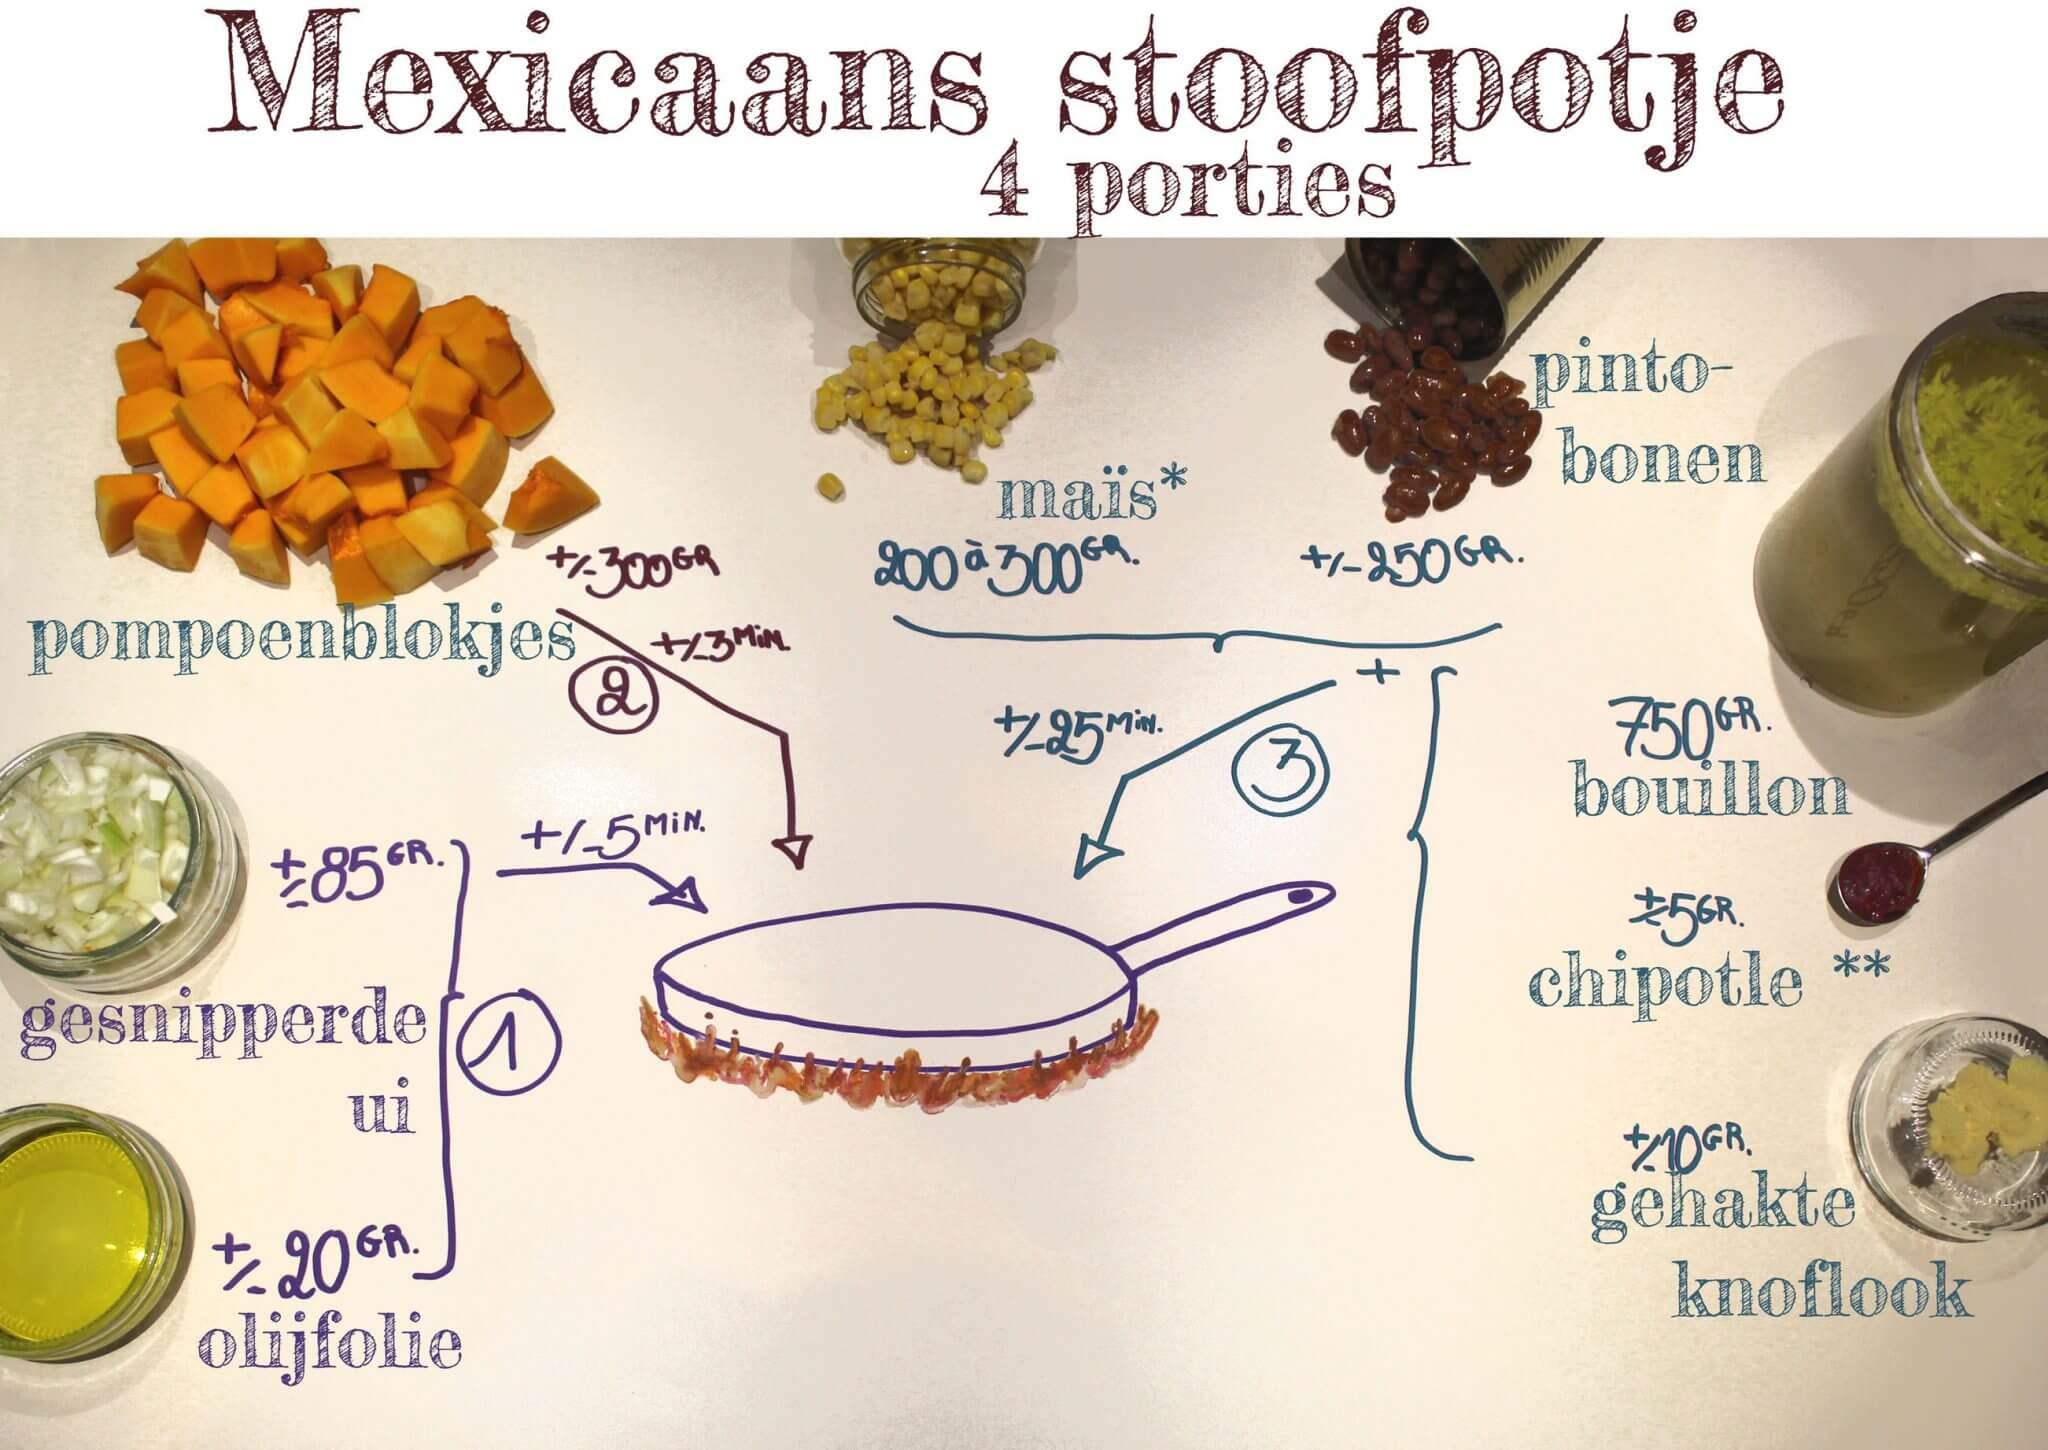 stappenplan Mexicaanse stoofschotel.jpg